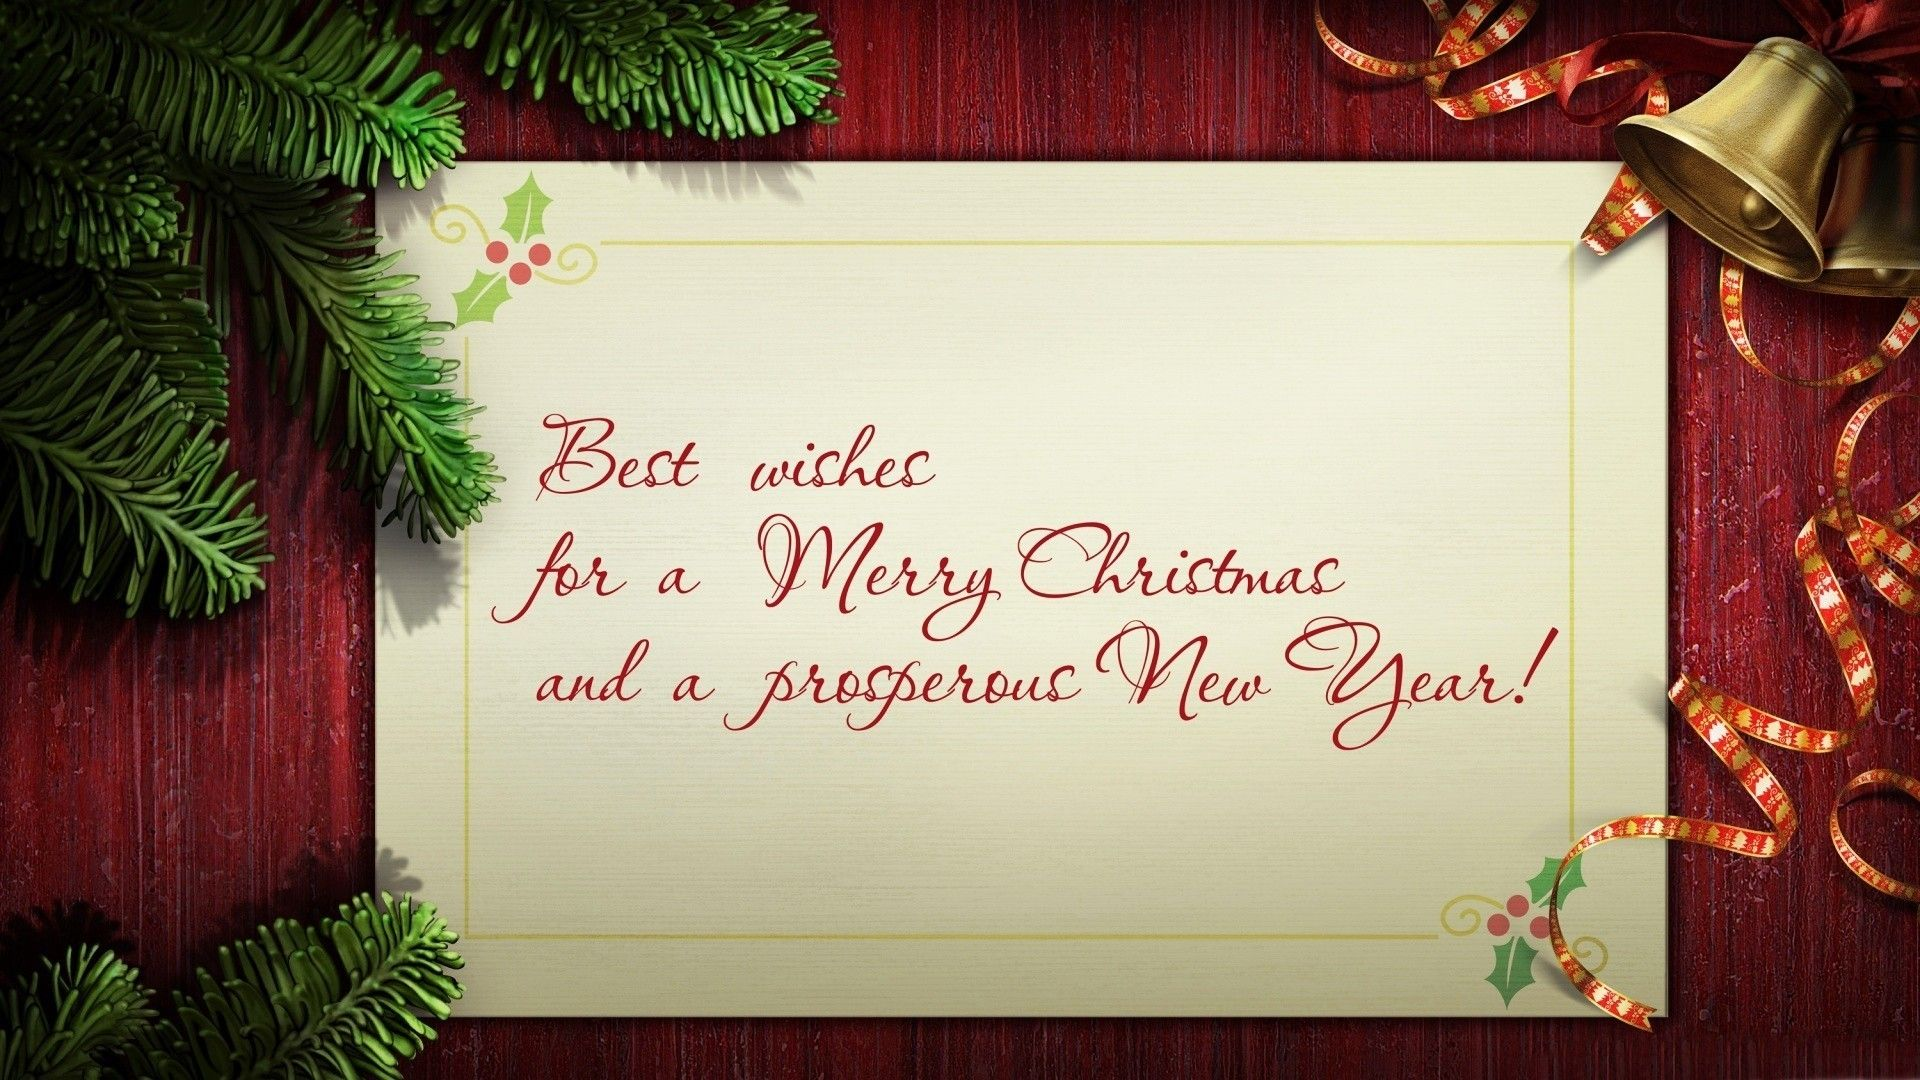 Merry Christmas Greetings Card Wallpaper HD